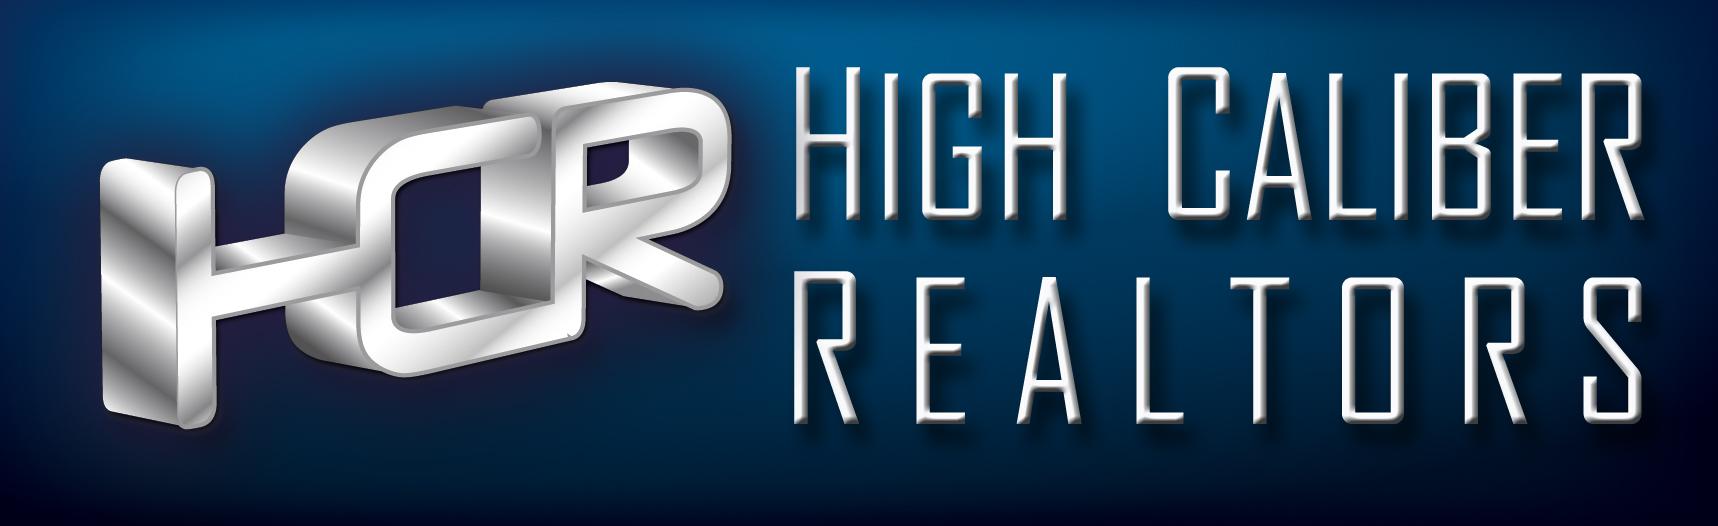 HCRealtors+Long+on+real+blue_+copy (1).jpg